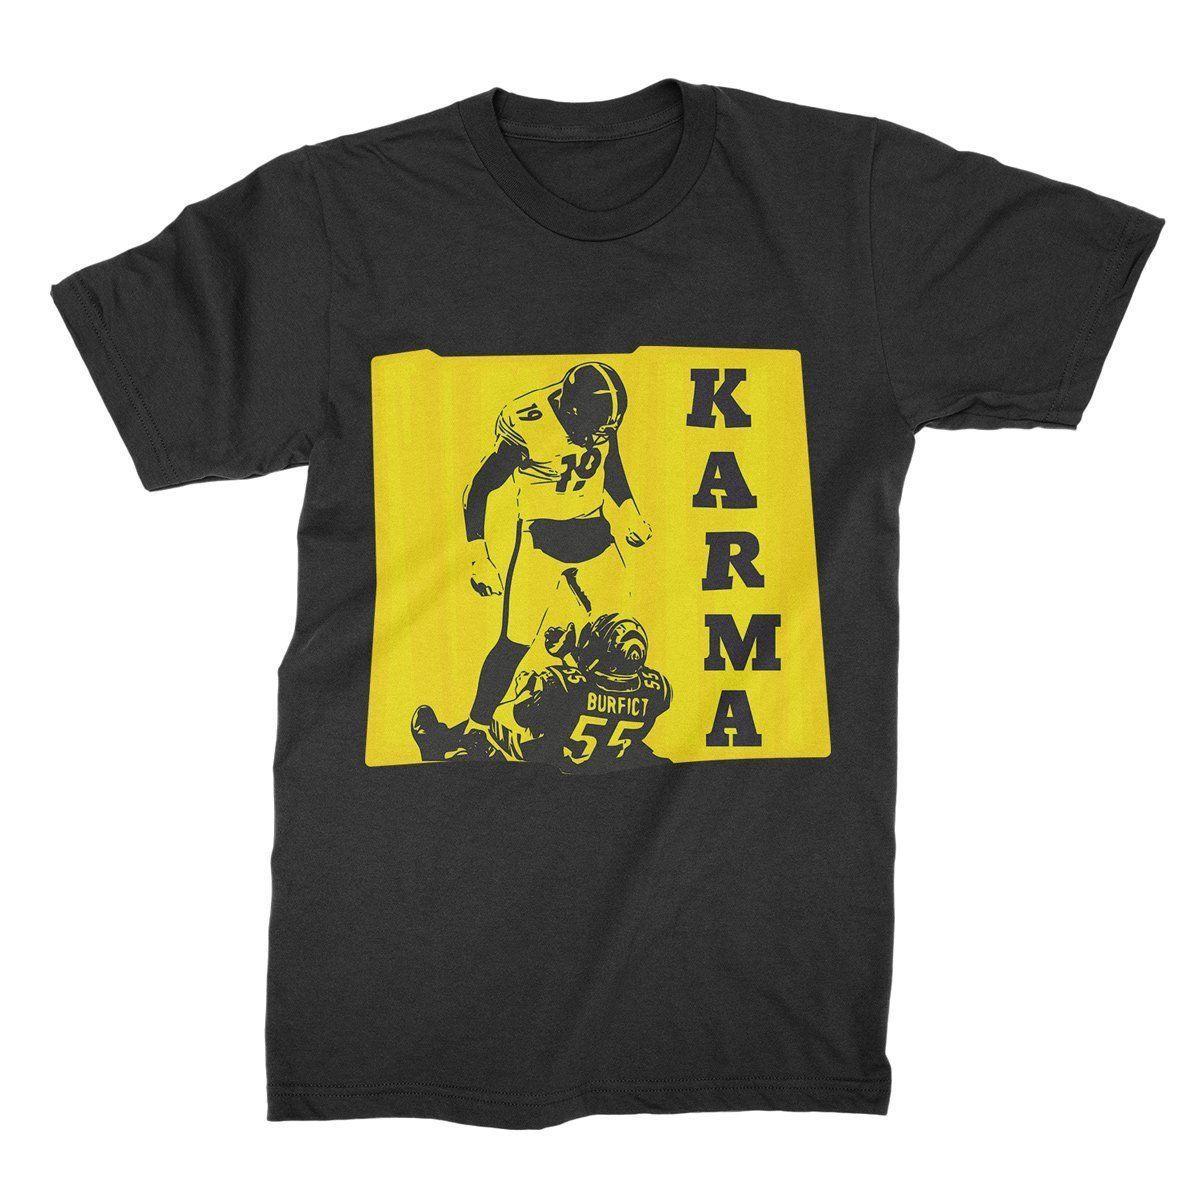 super popular 013f4 ea726 Steelers Karma Shirt Juju Smith Schuster T-Shirt Juju Karma Tee Antonio  Brown Ka fan pants t shirt